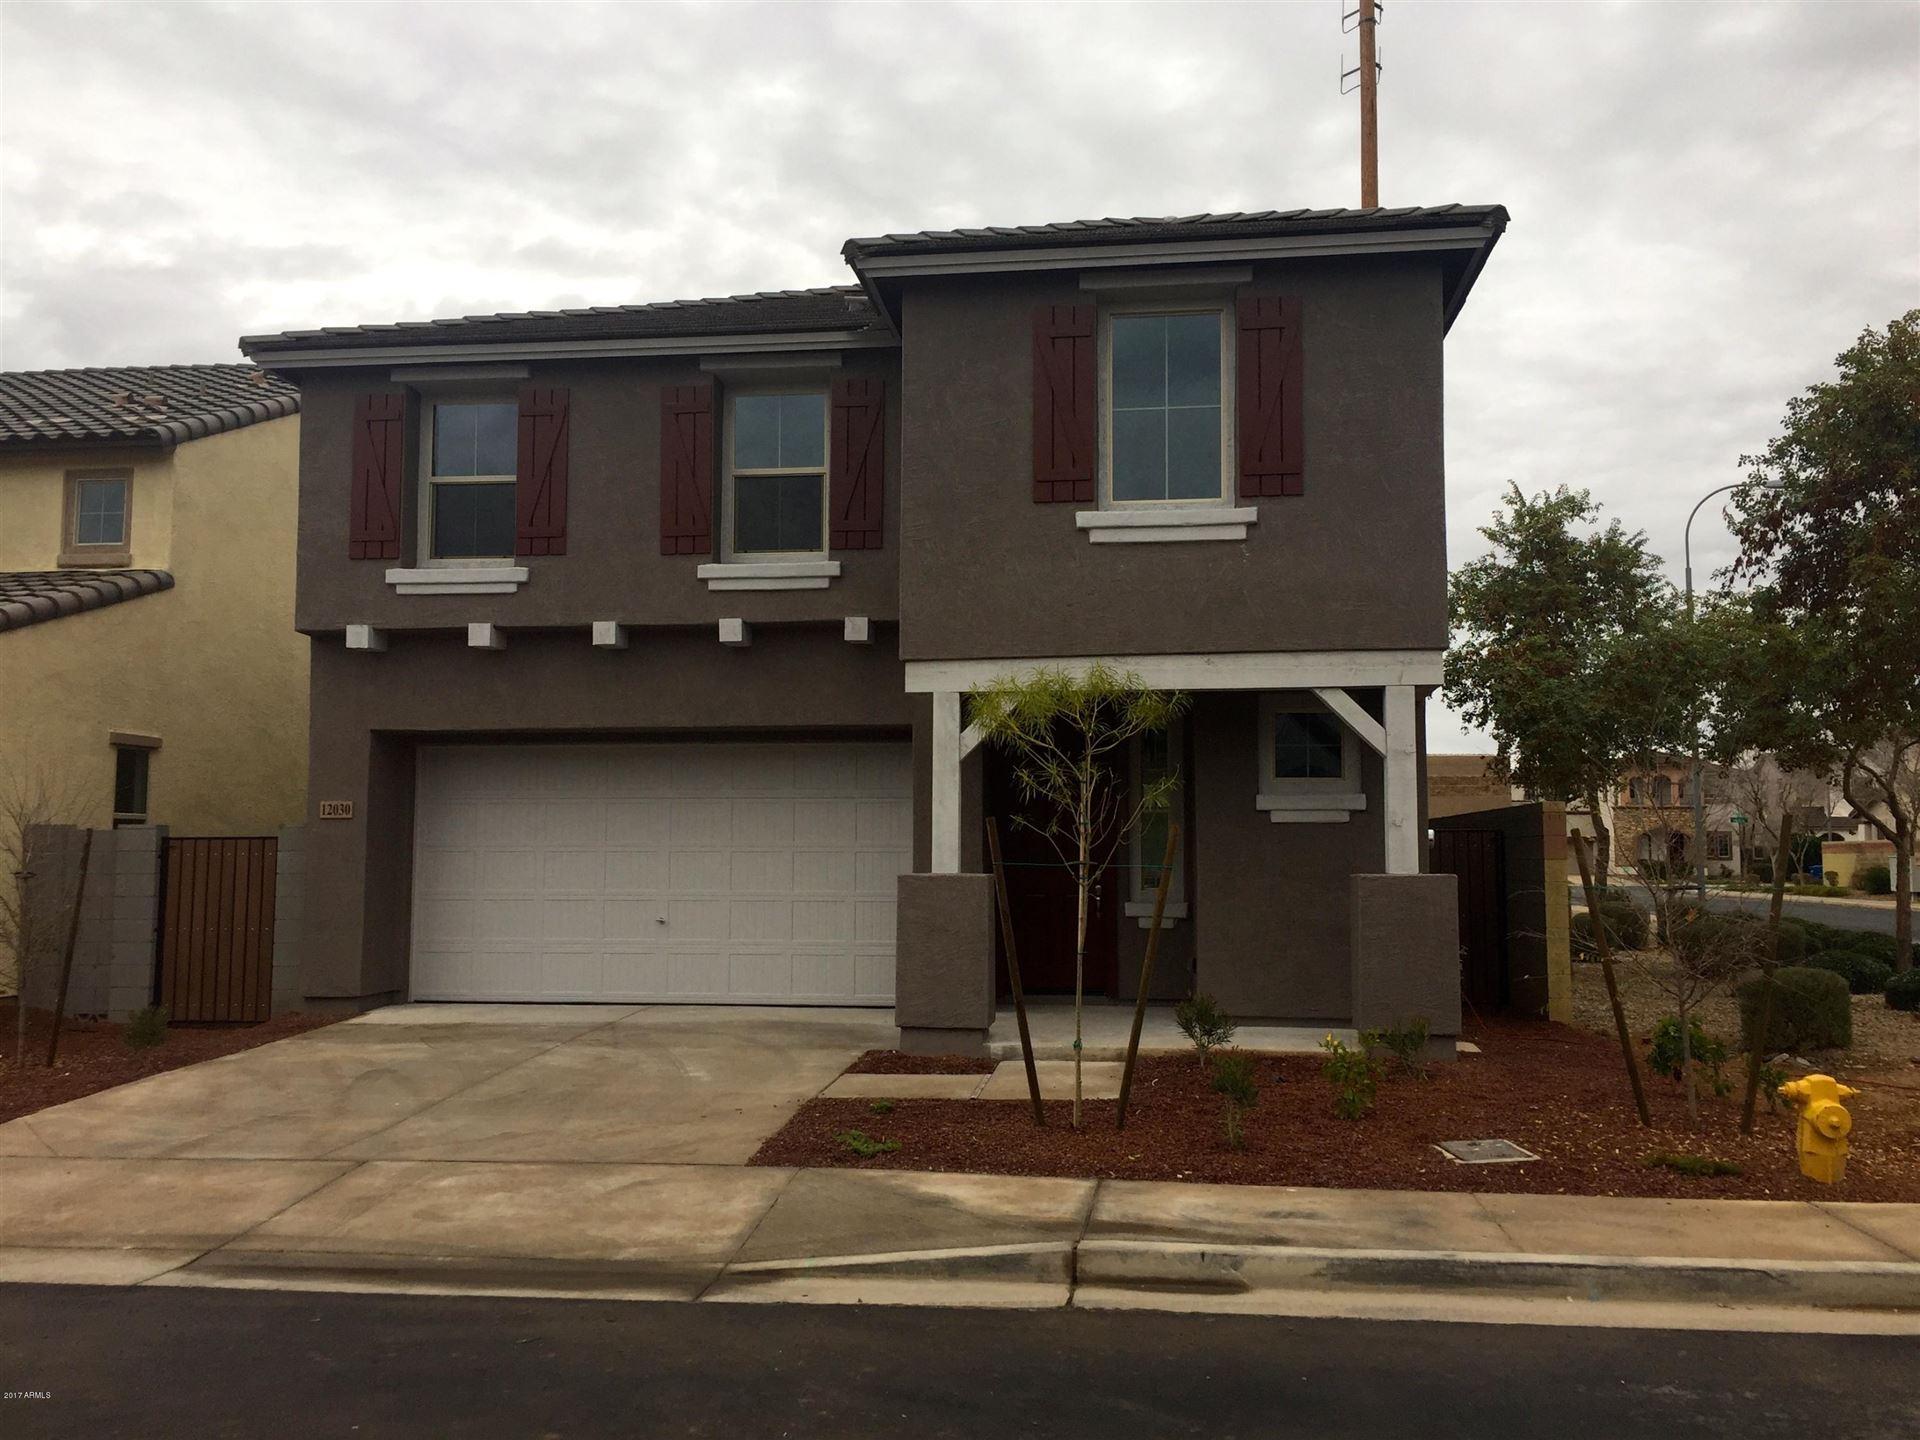 Photo of 12030 W FILLMORE Street, Avondale, AZ 85323 (MLS # 6232420)